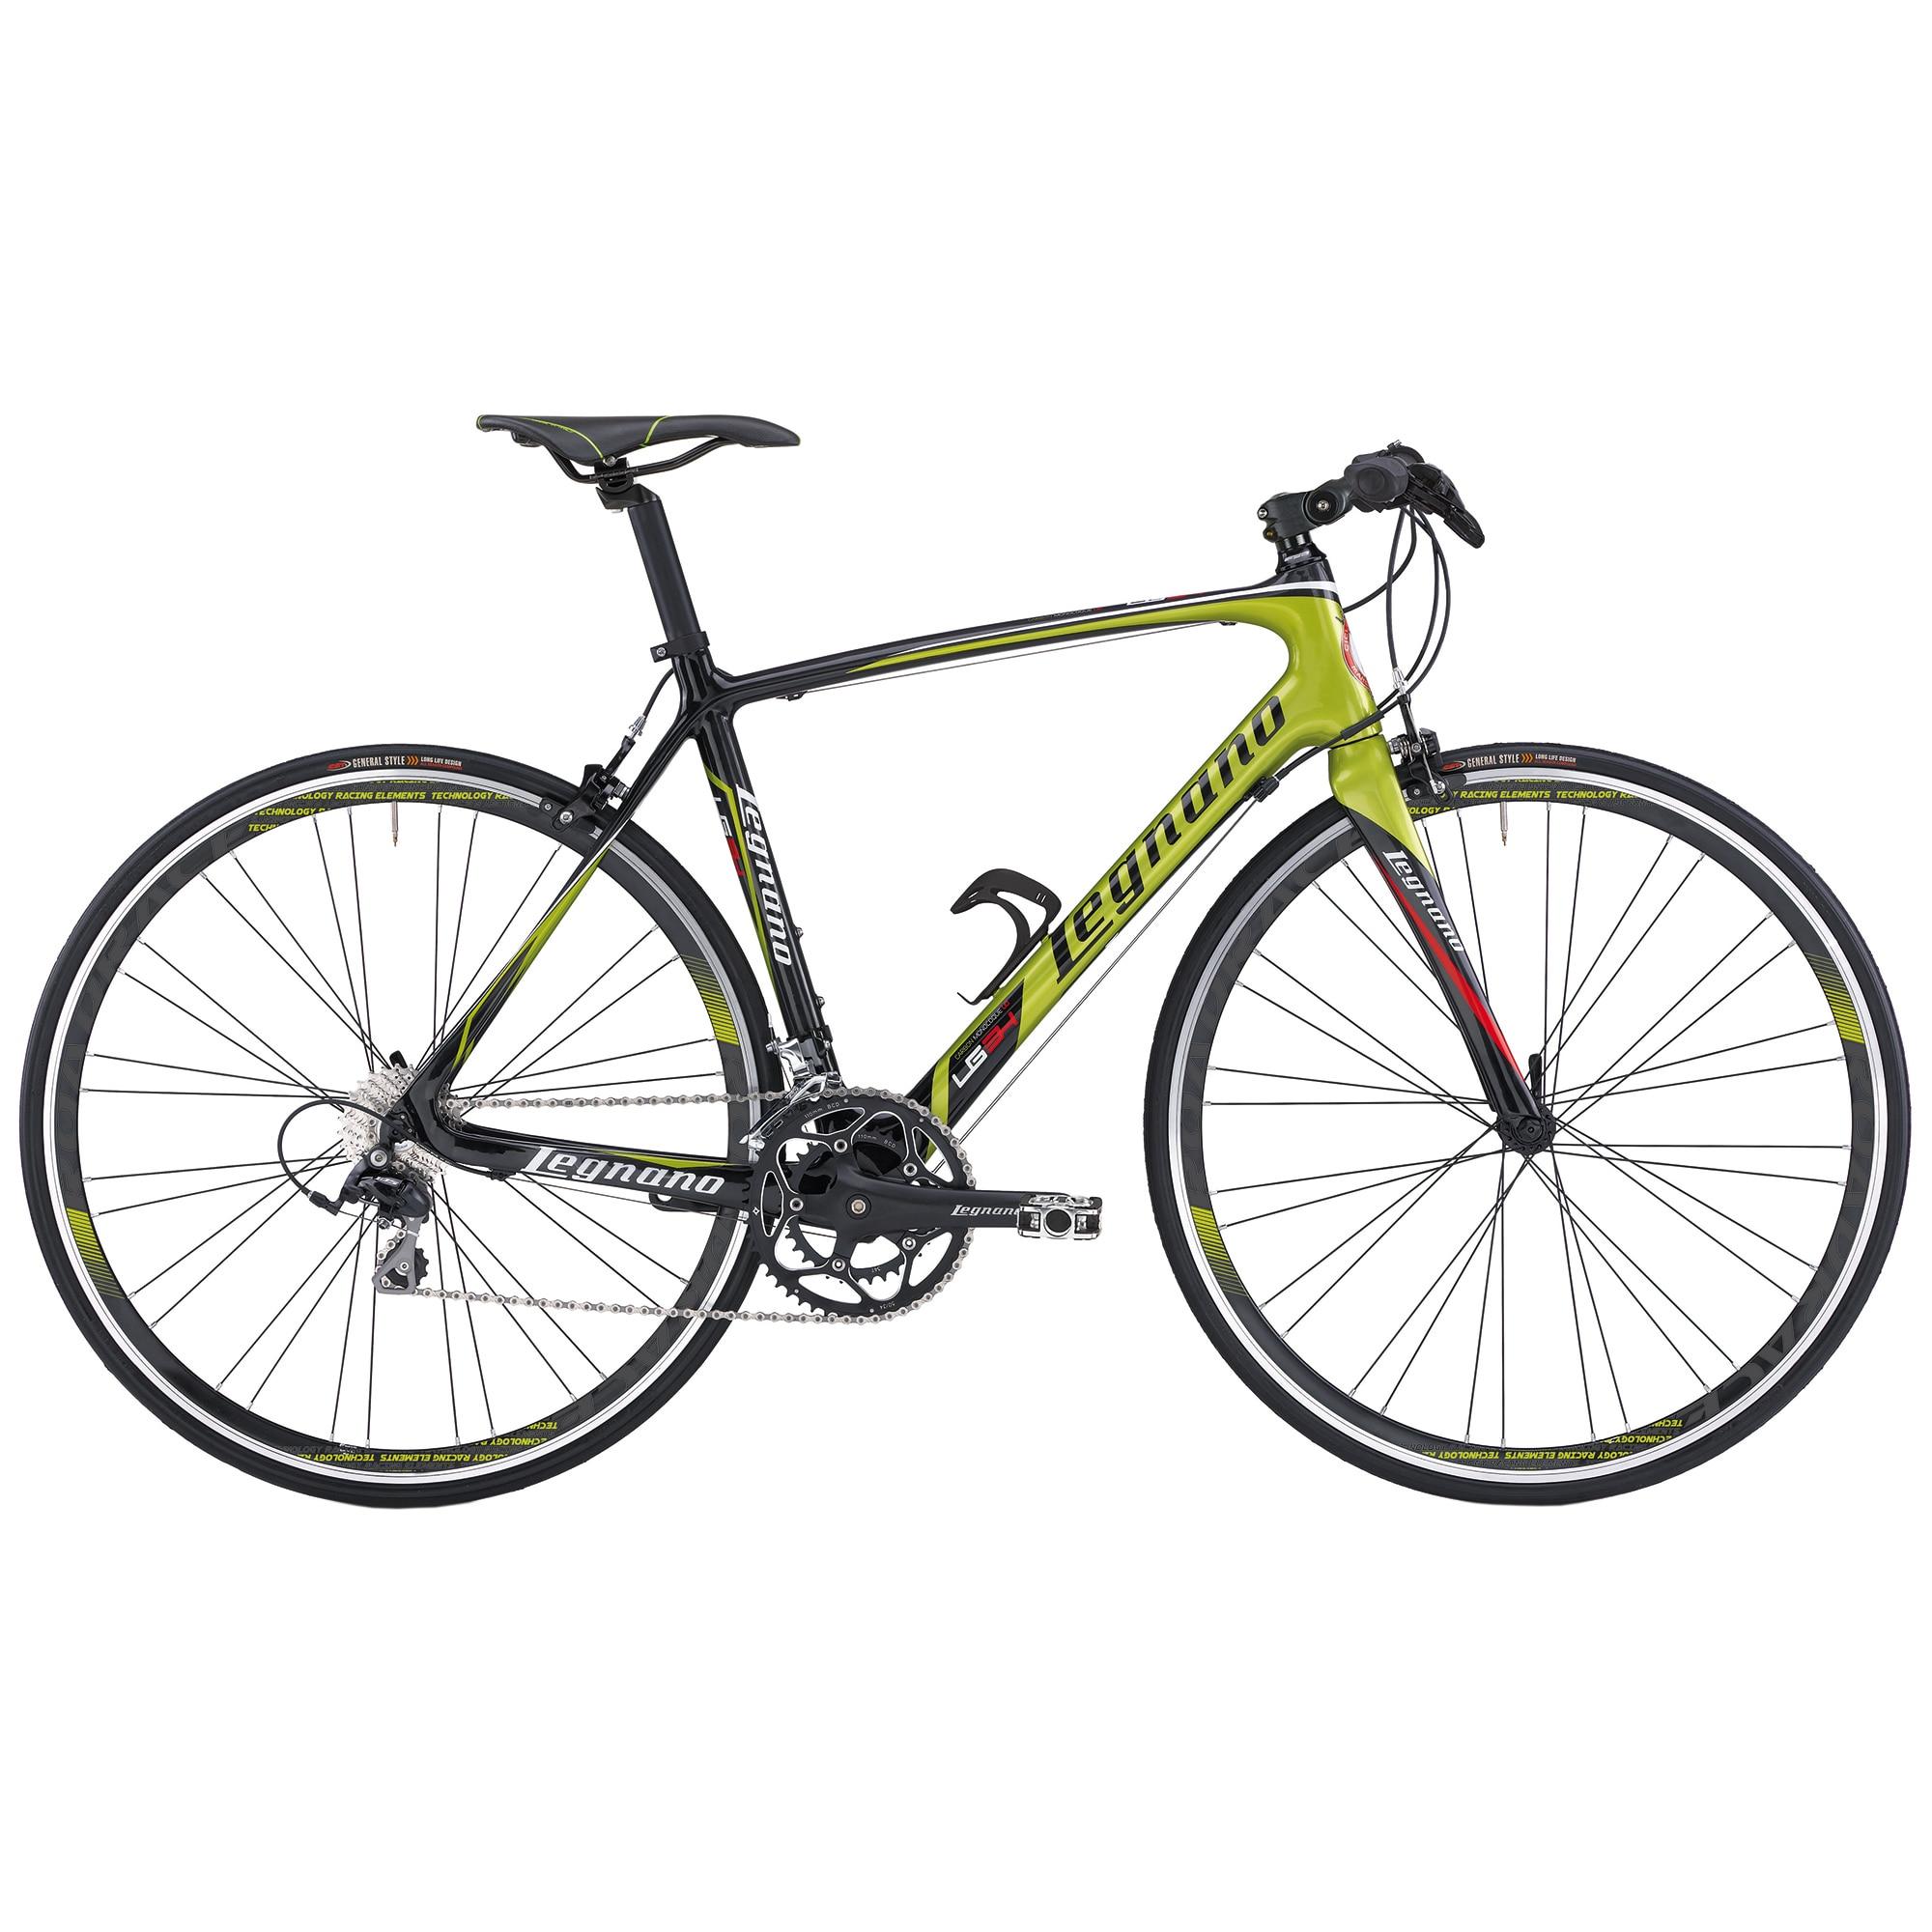 "Fotografie Bicicleta Trekking 28"" Legnano Flat LG34, Carbon, Green/Black, 49cm"